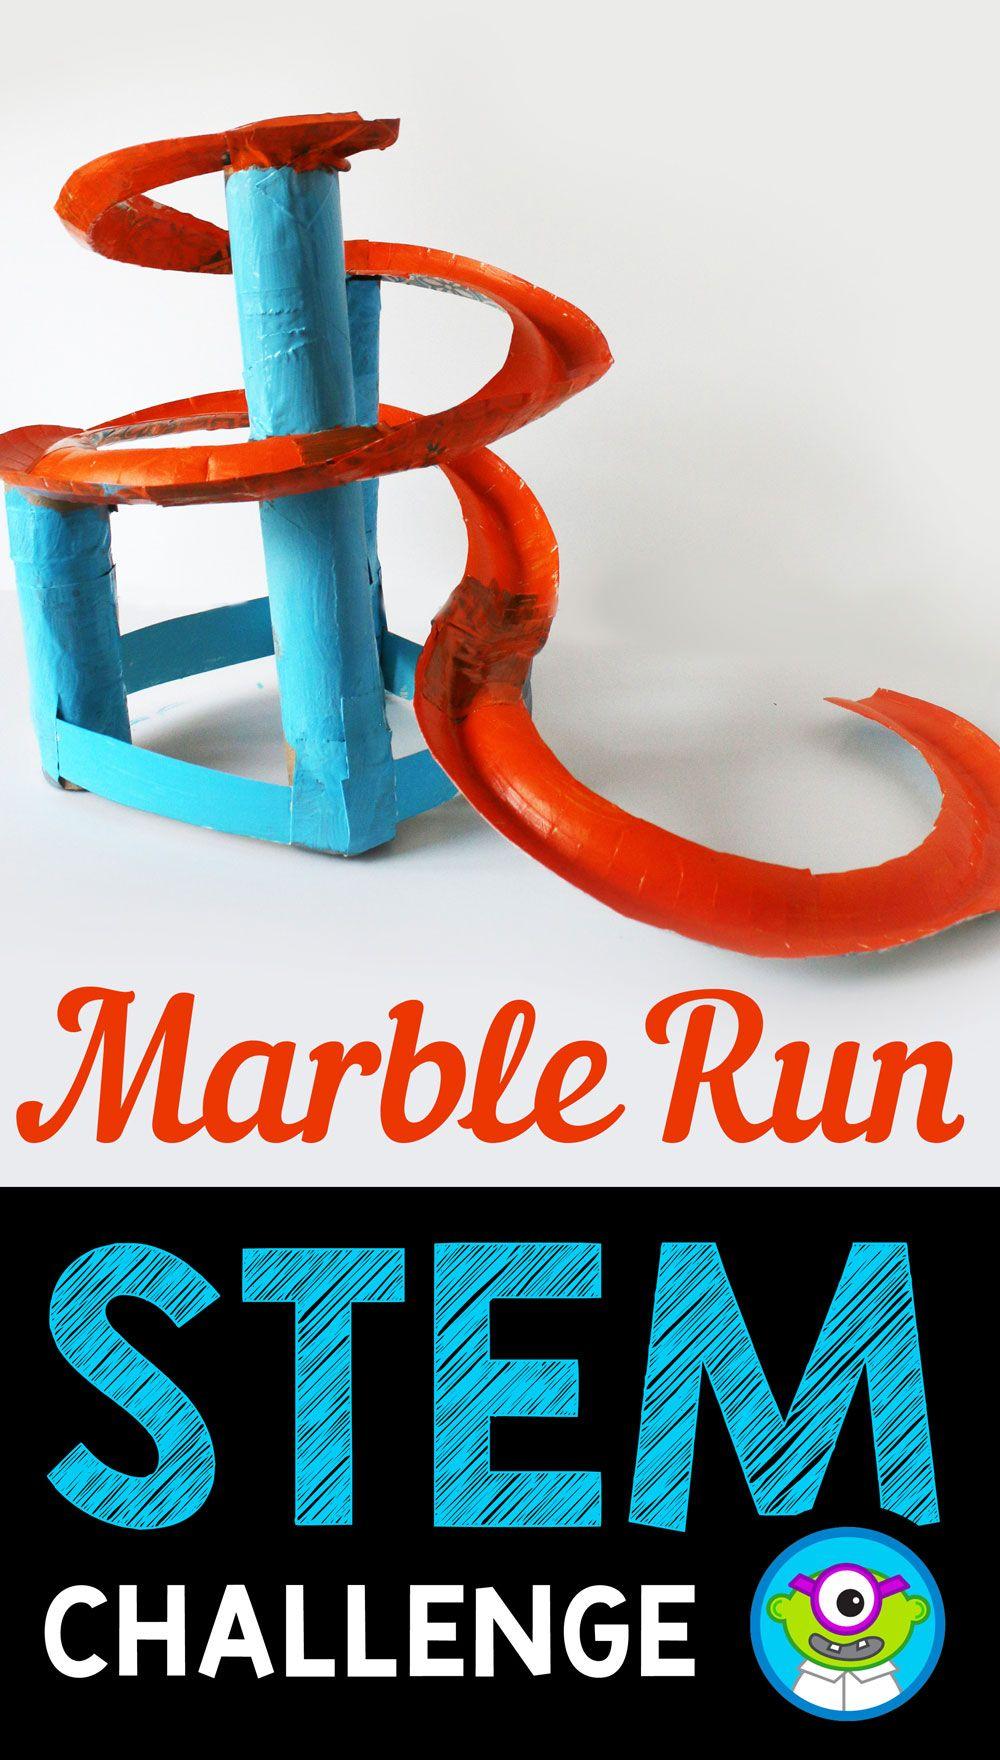 Stem Activity Challenge Marble Run 3rd 5th Grade Stem Activities Middle School Elementary Stem Activities Stem Projects Middle School